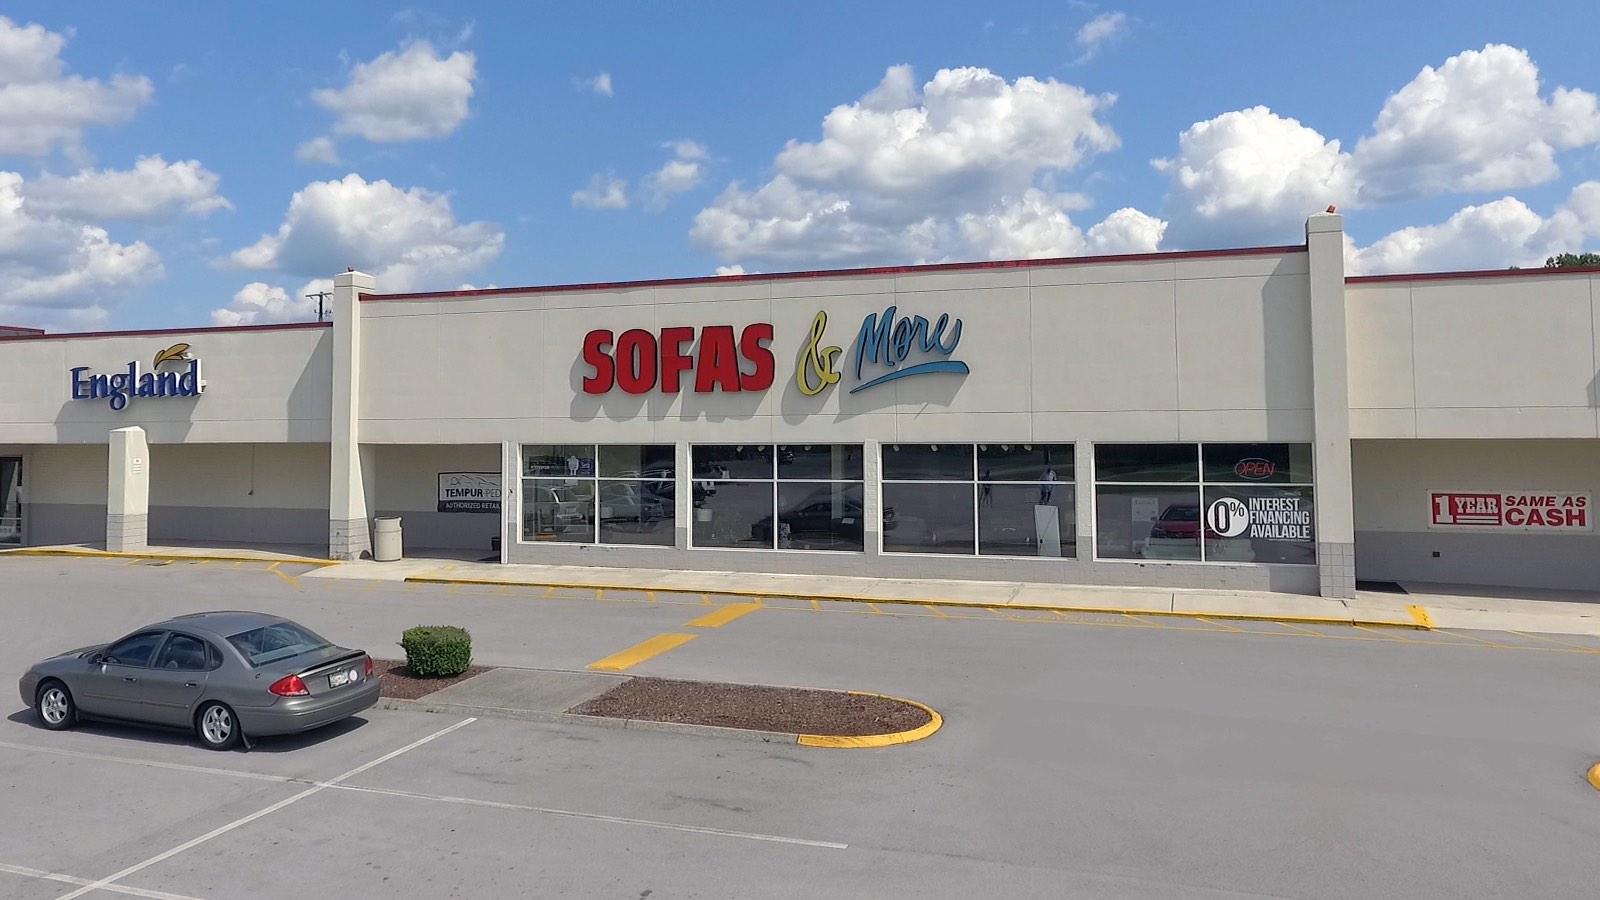 Reopening Sofas & More